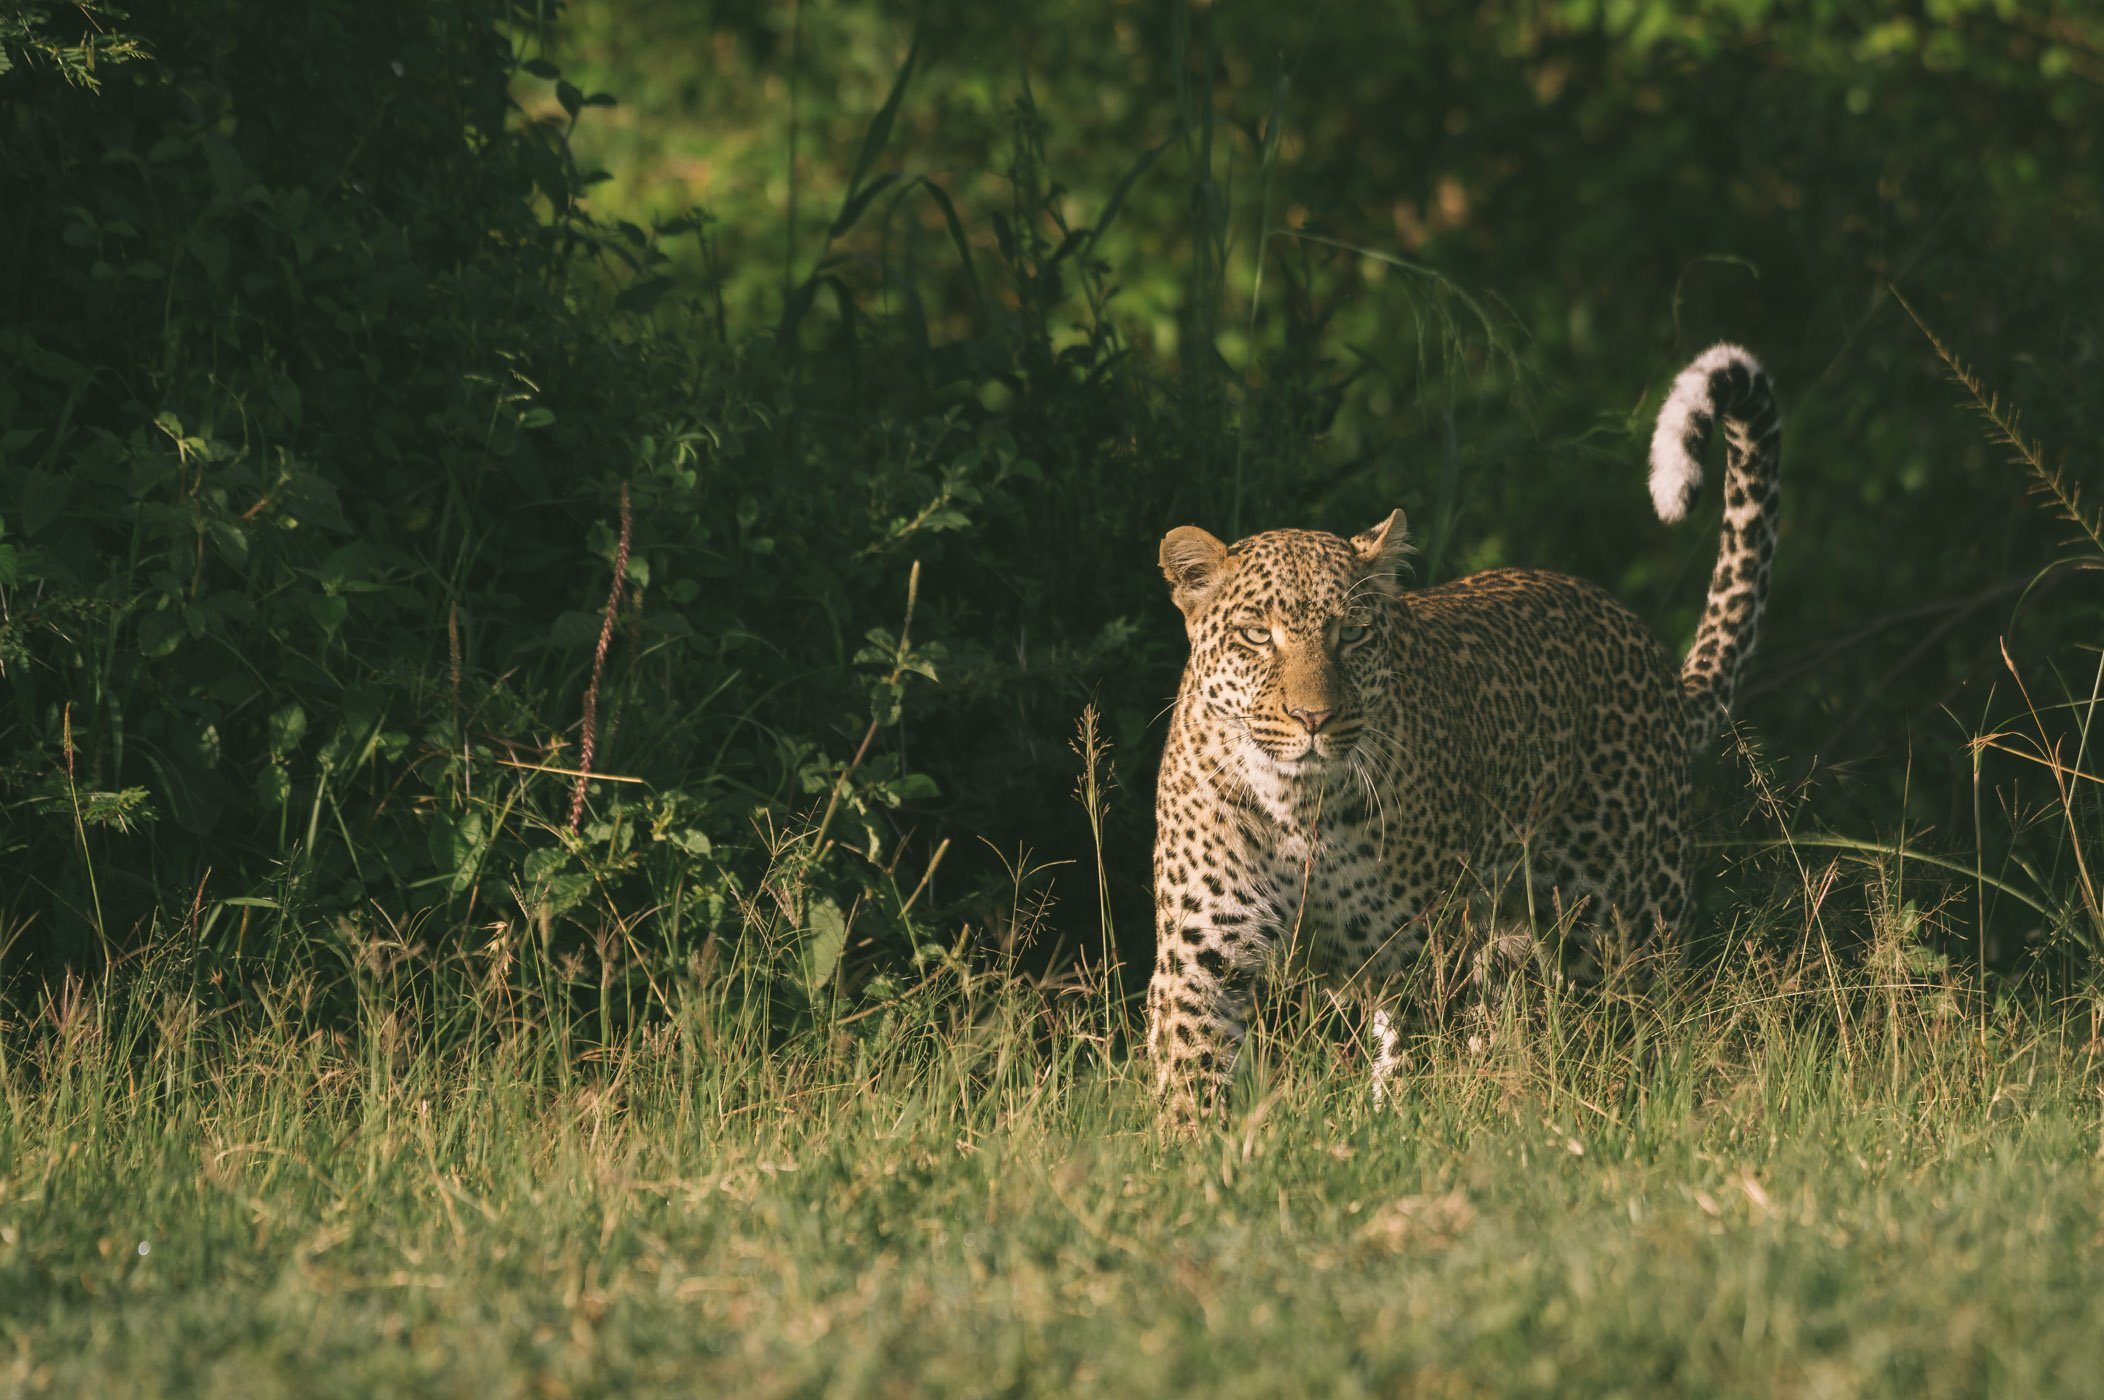 Leopard in the Maasai Mara in Kenya